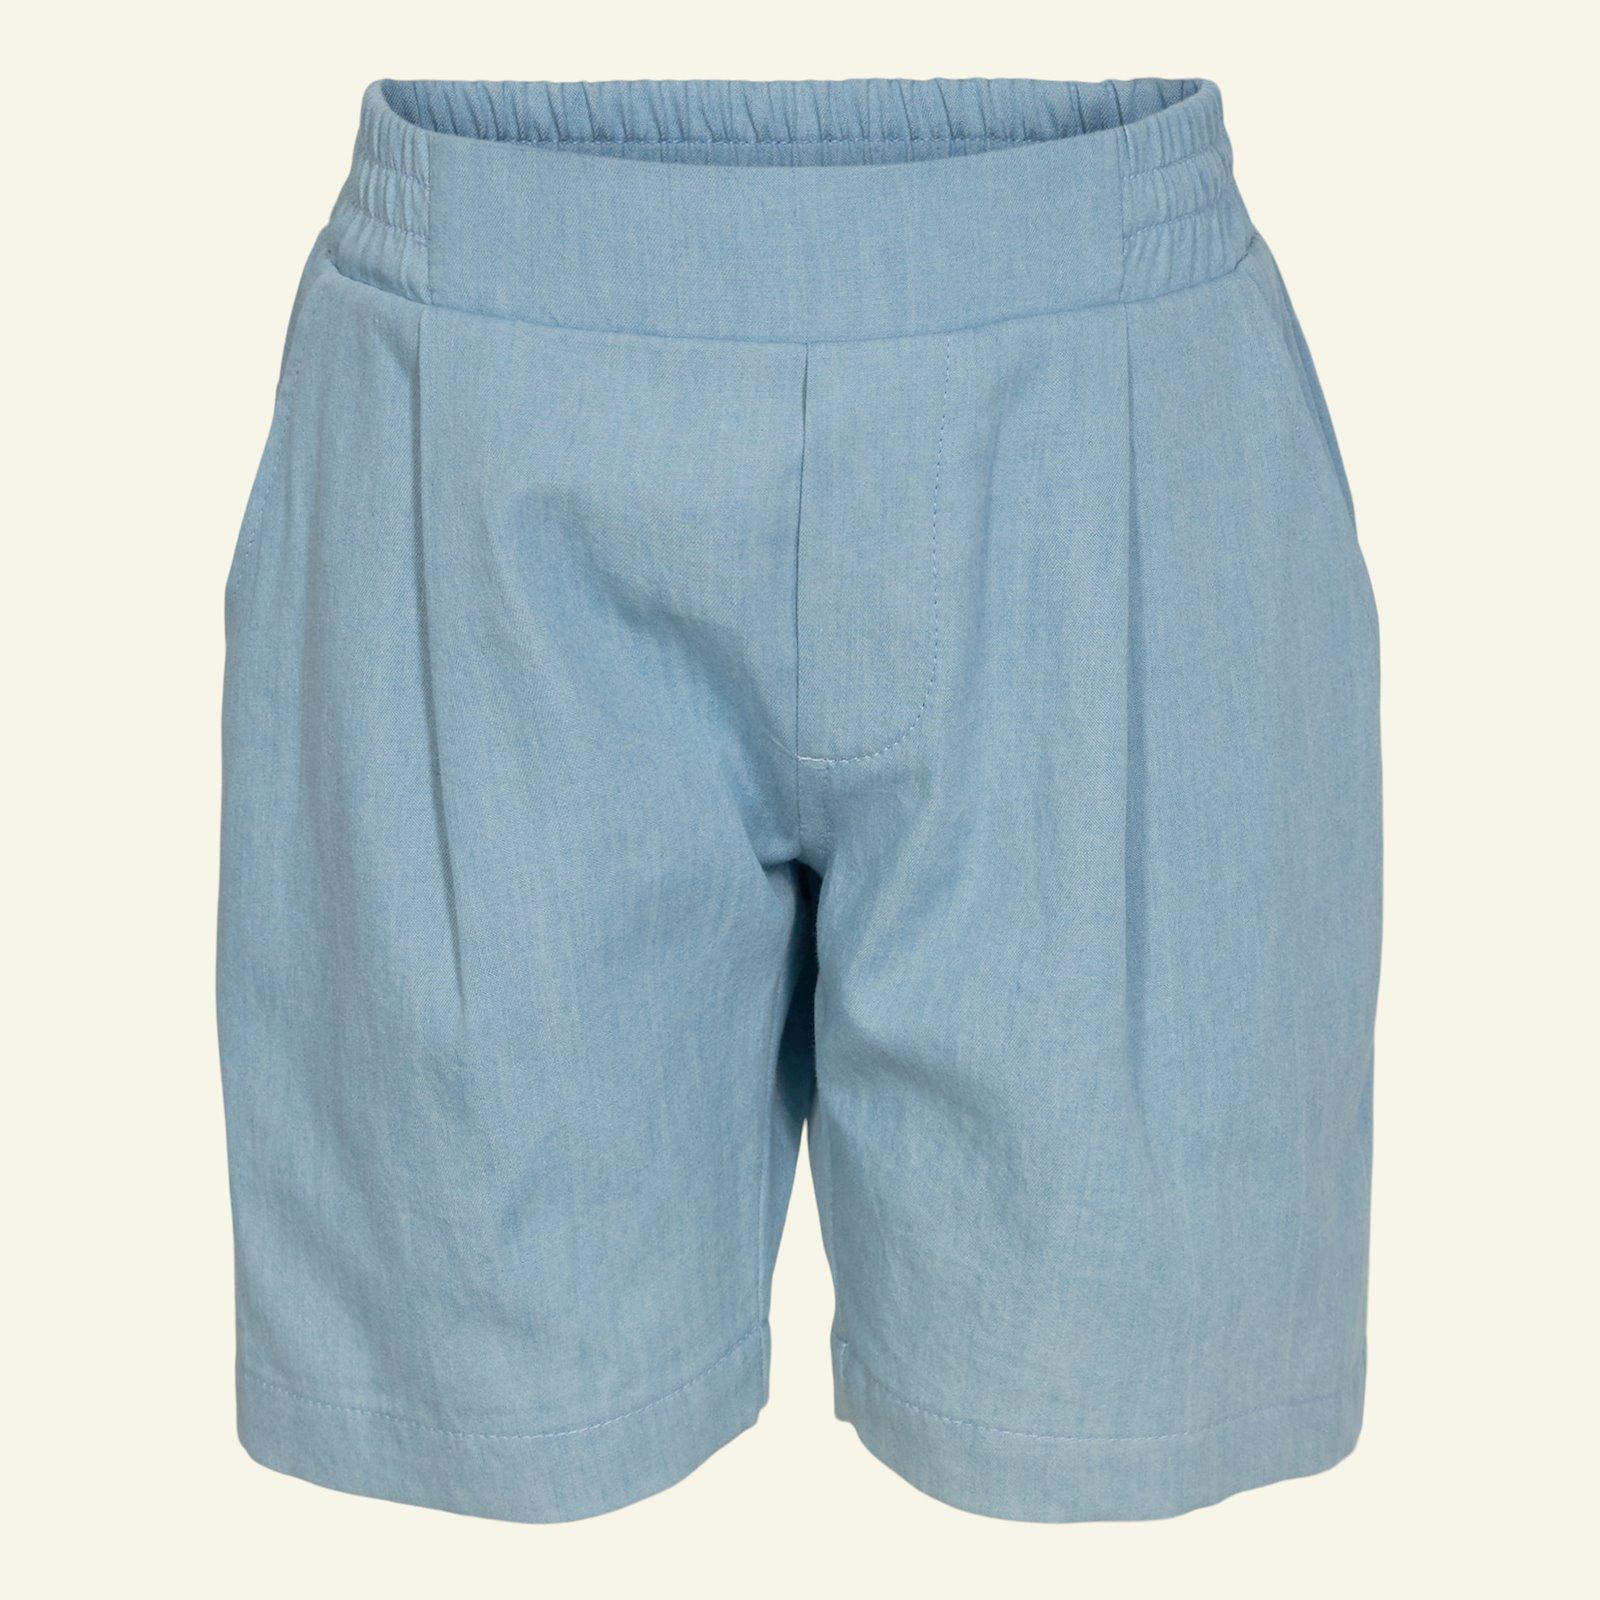 Chino shorts, 110/5y p60036_400237_sskit